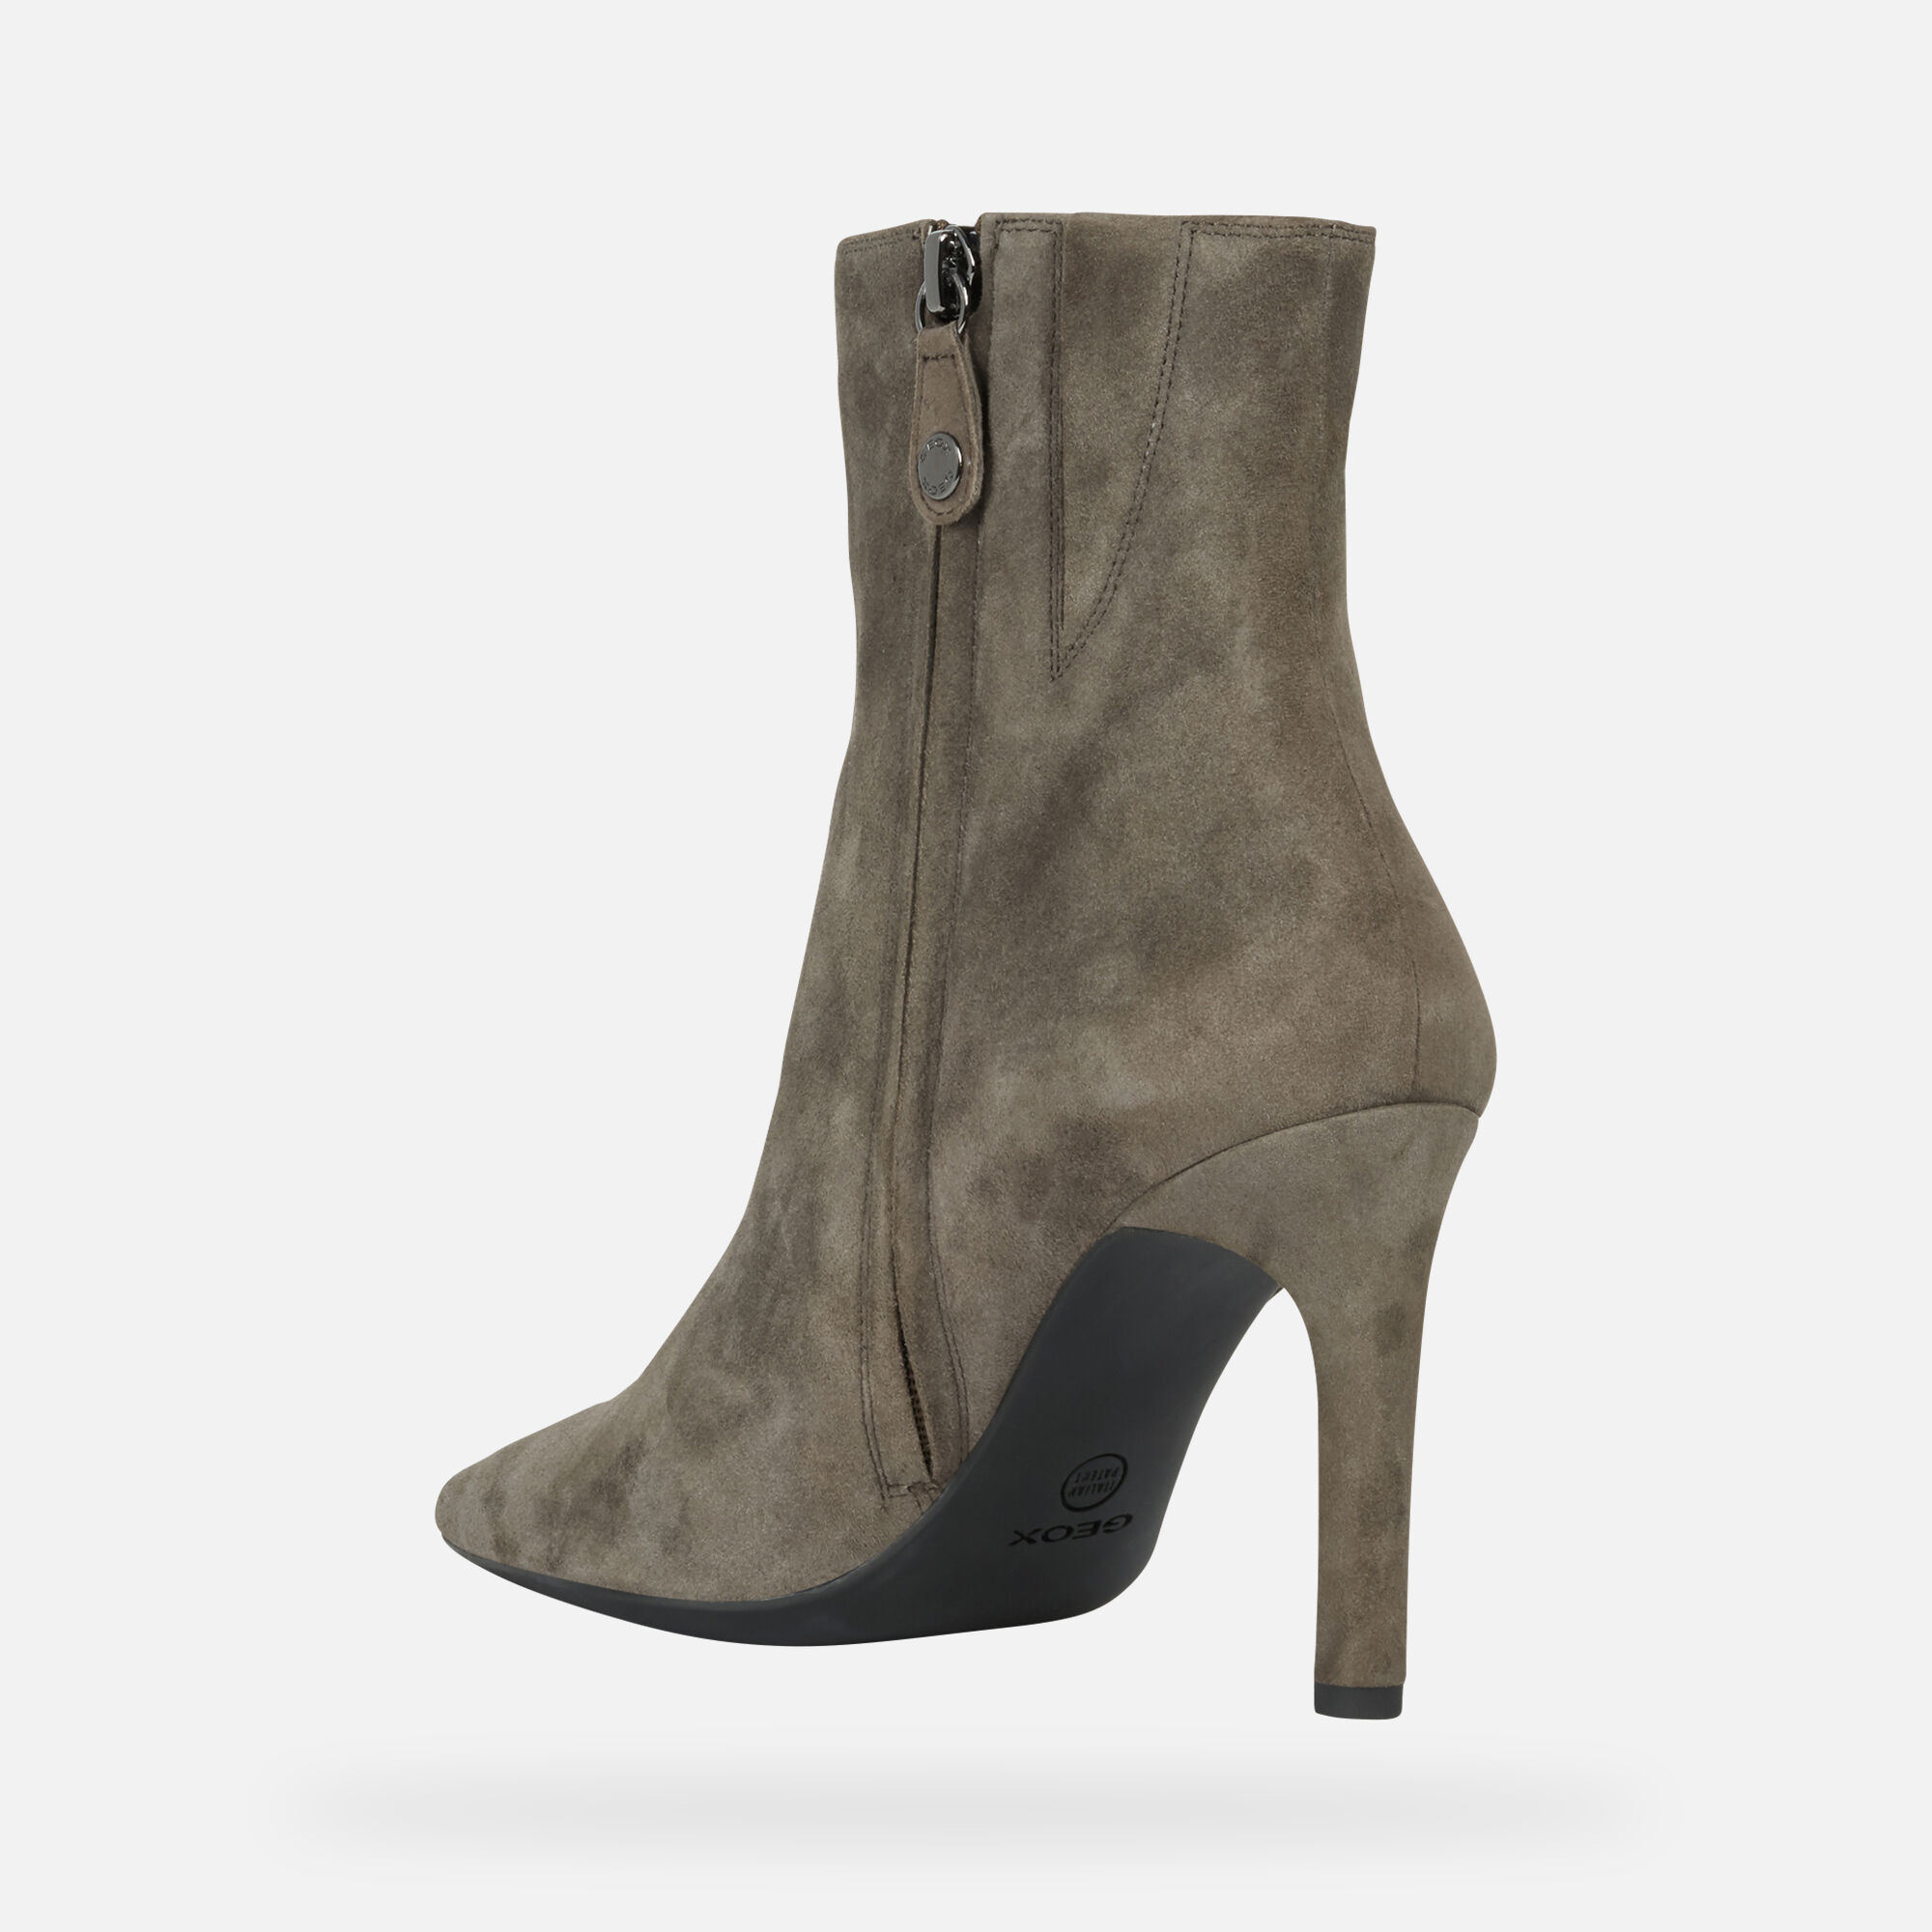 Geox FAVIOLA Frau: haselnussbraune ankle Boots   Geox ®